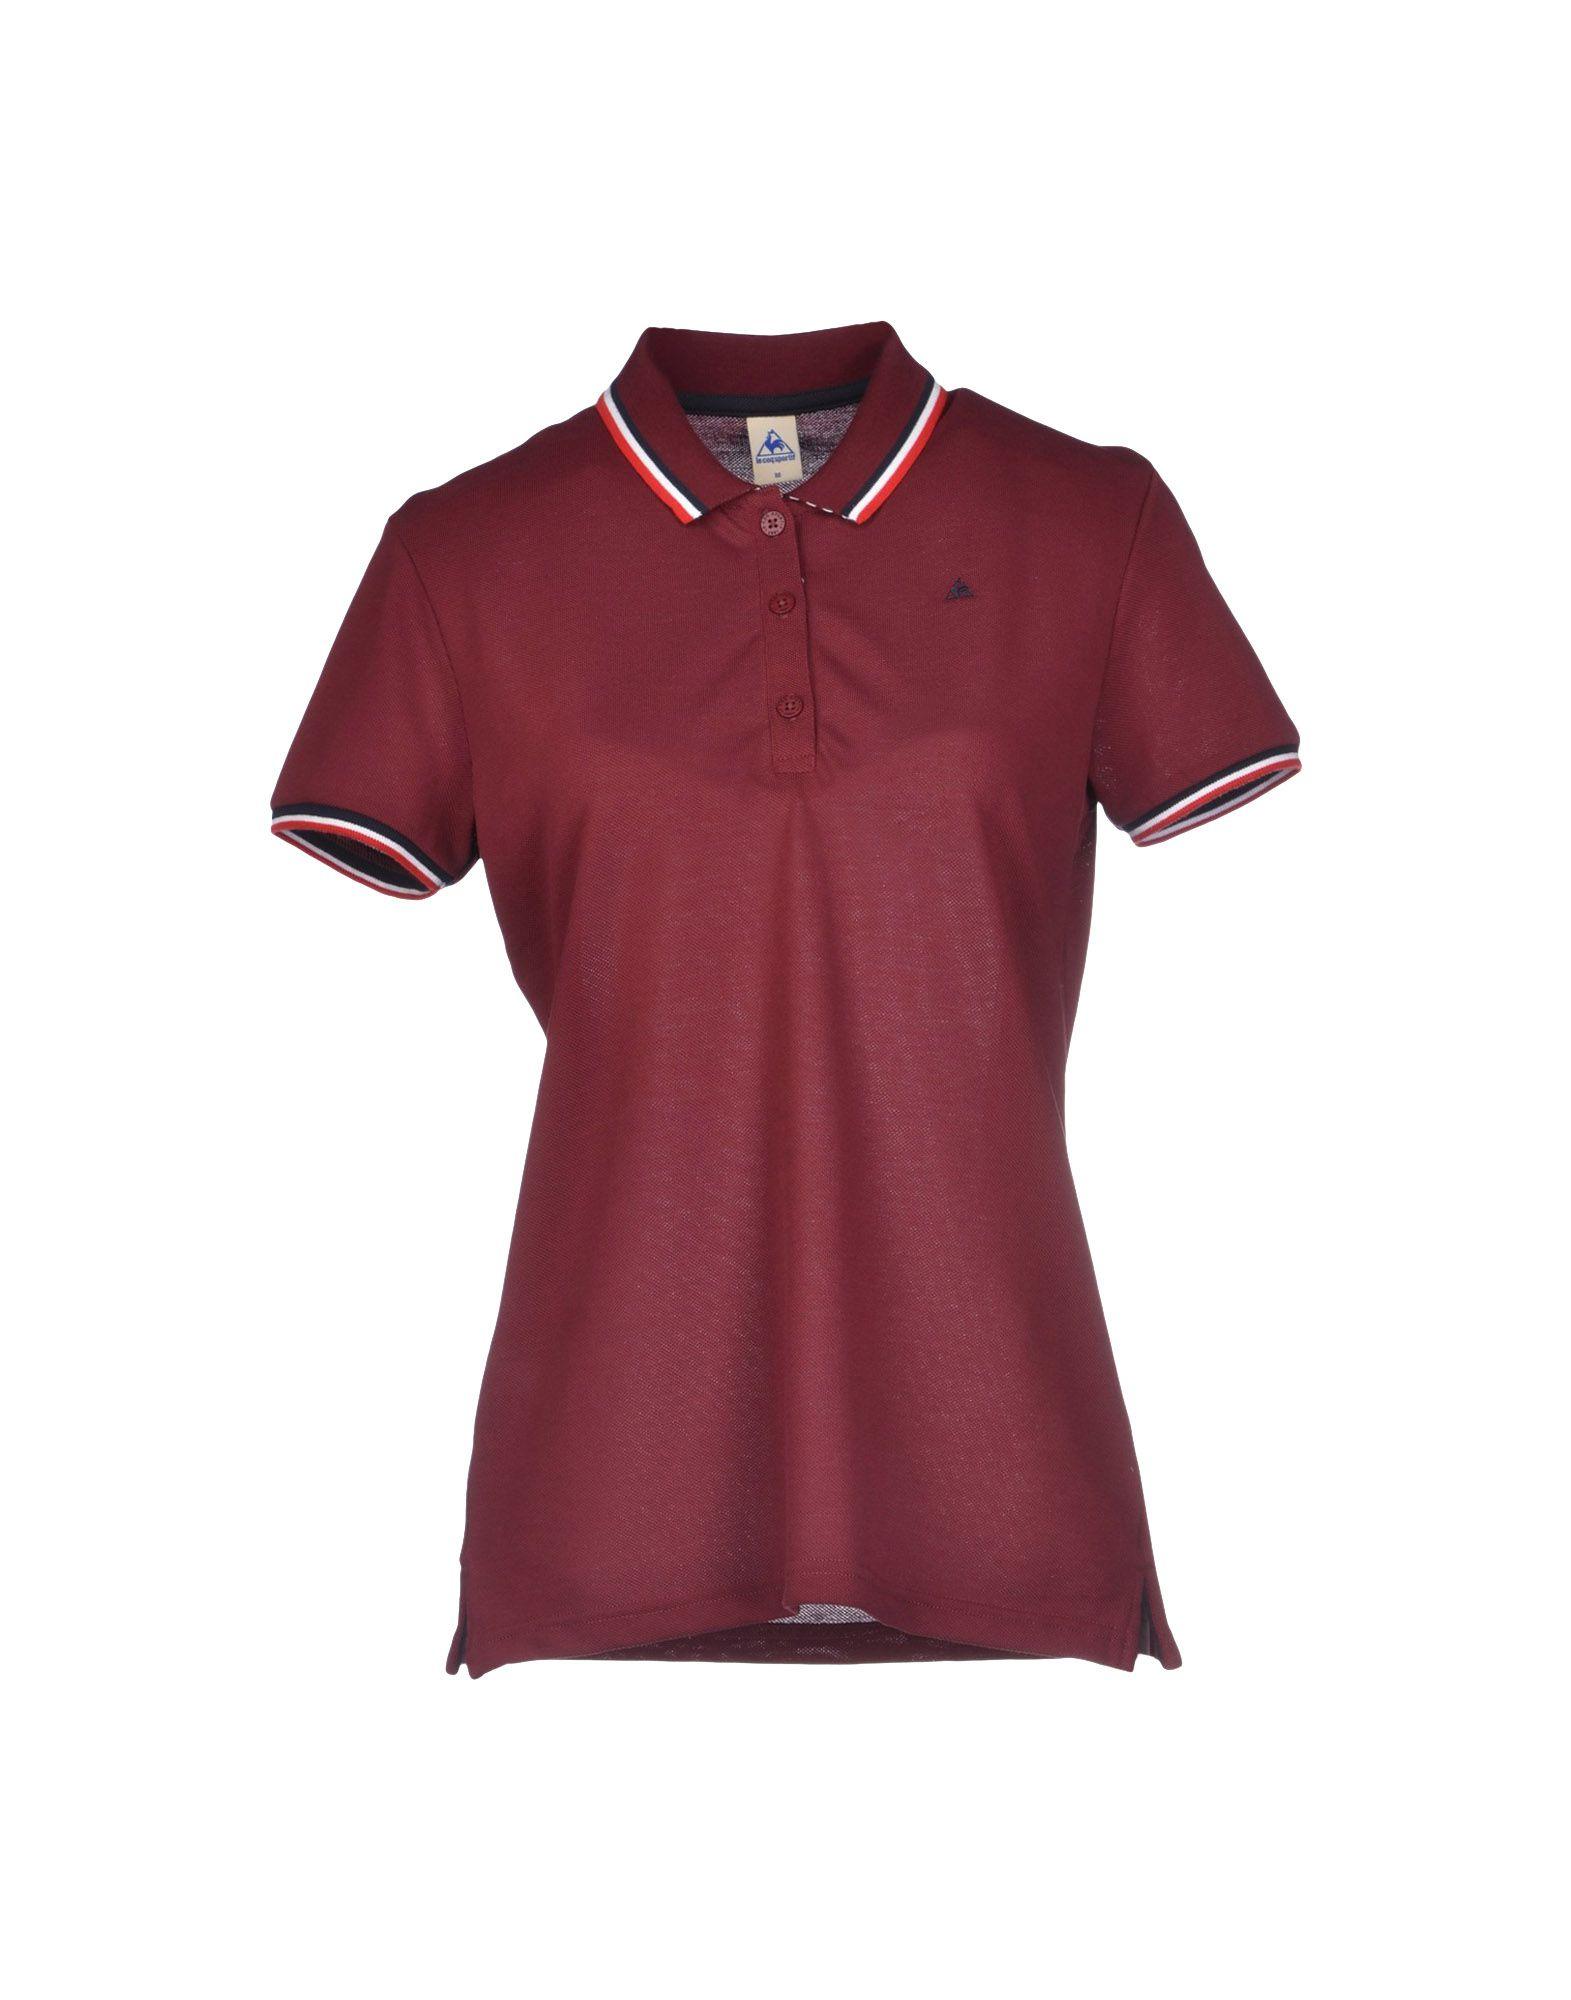 le coq sportif shirt - photo #11